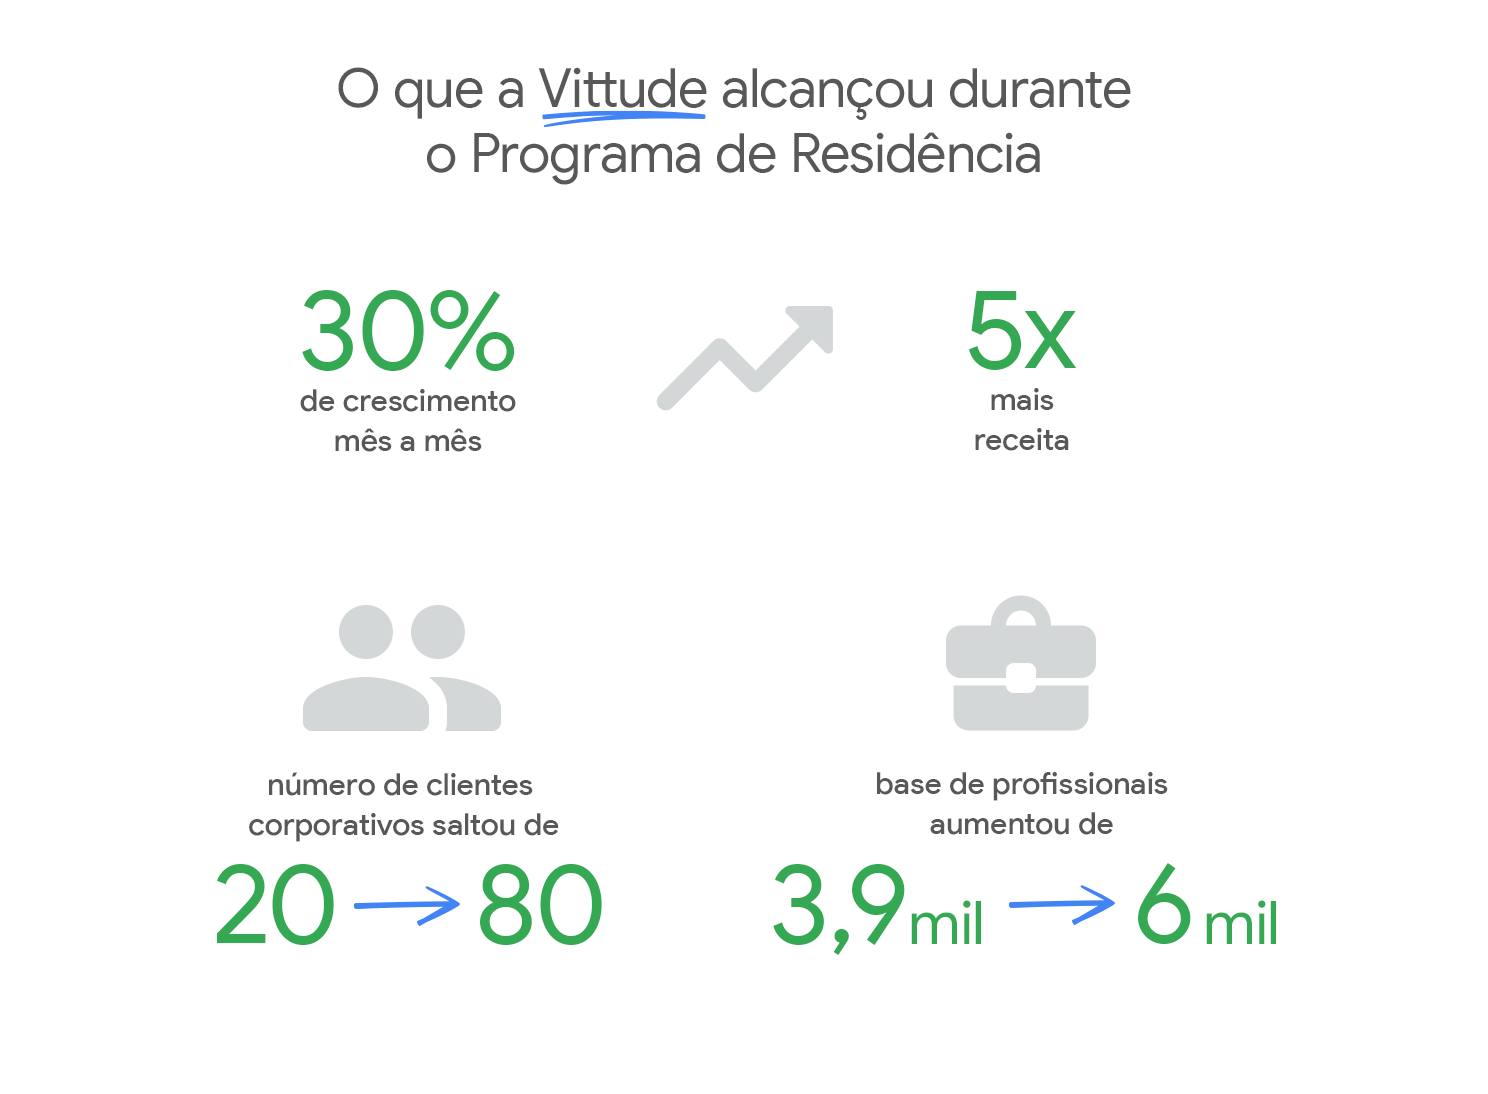 Principais números de crescimento da Vittude durante o Programa de Residência.